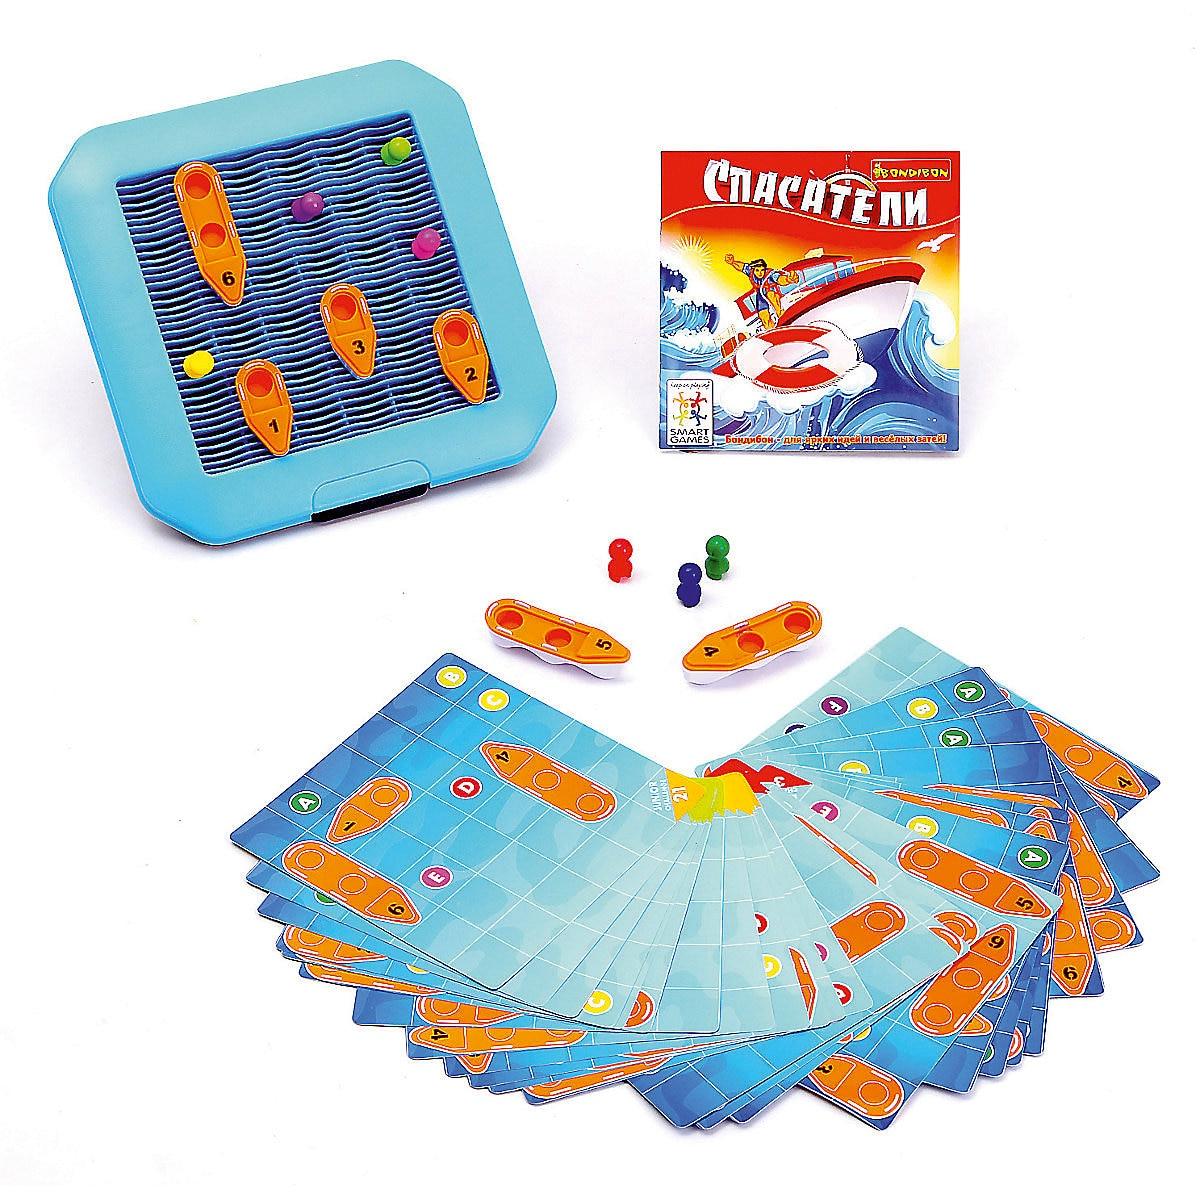 BONDIBON Party Games 7419998 educational toys puzzle game toy puzzle toy educational toy panda shape magic cube